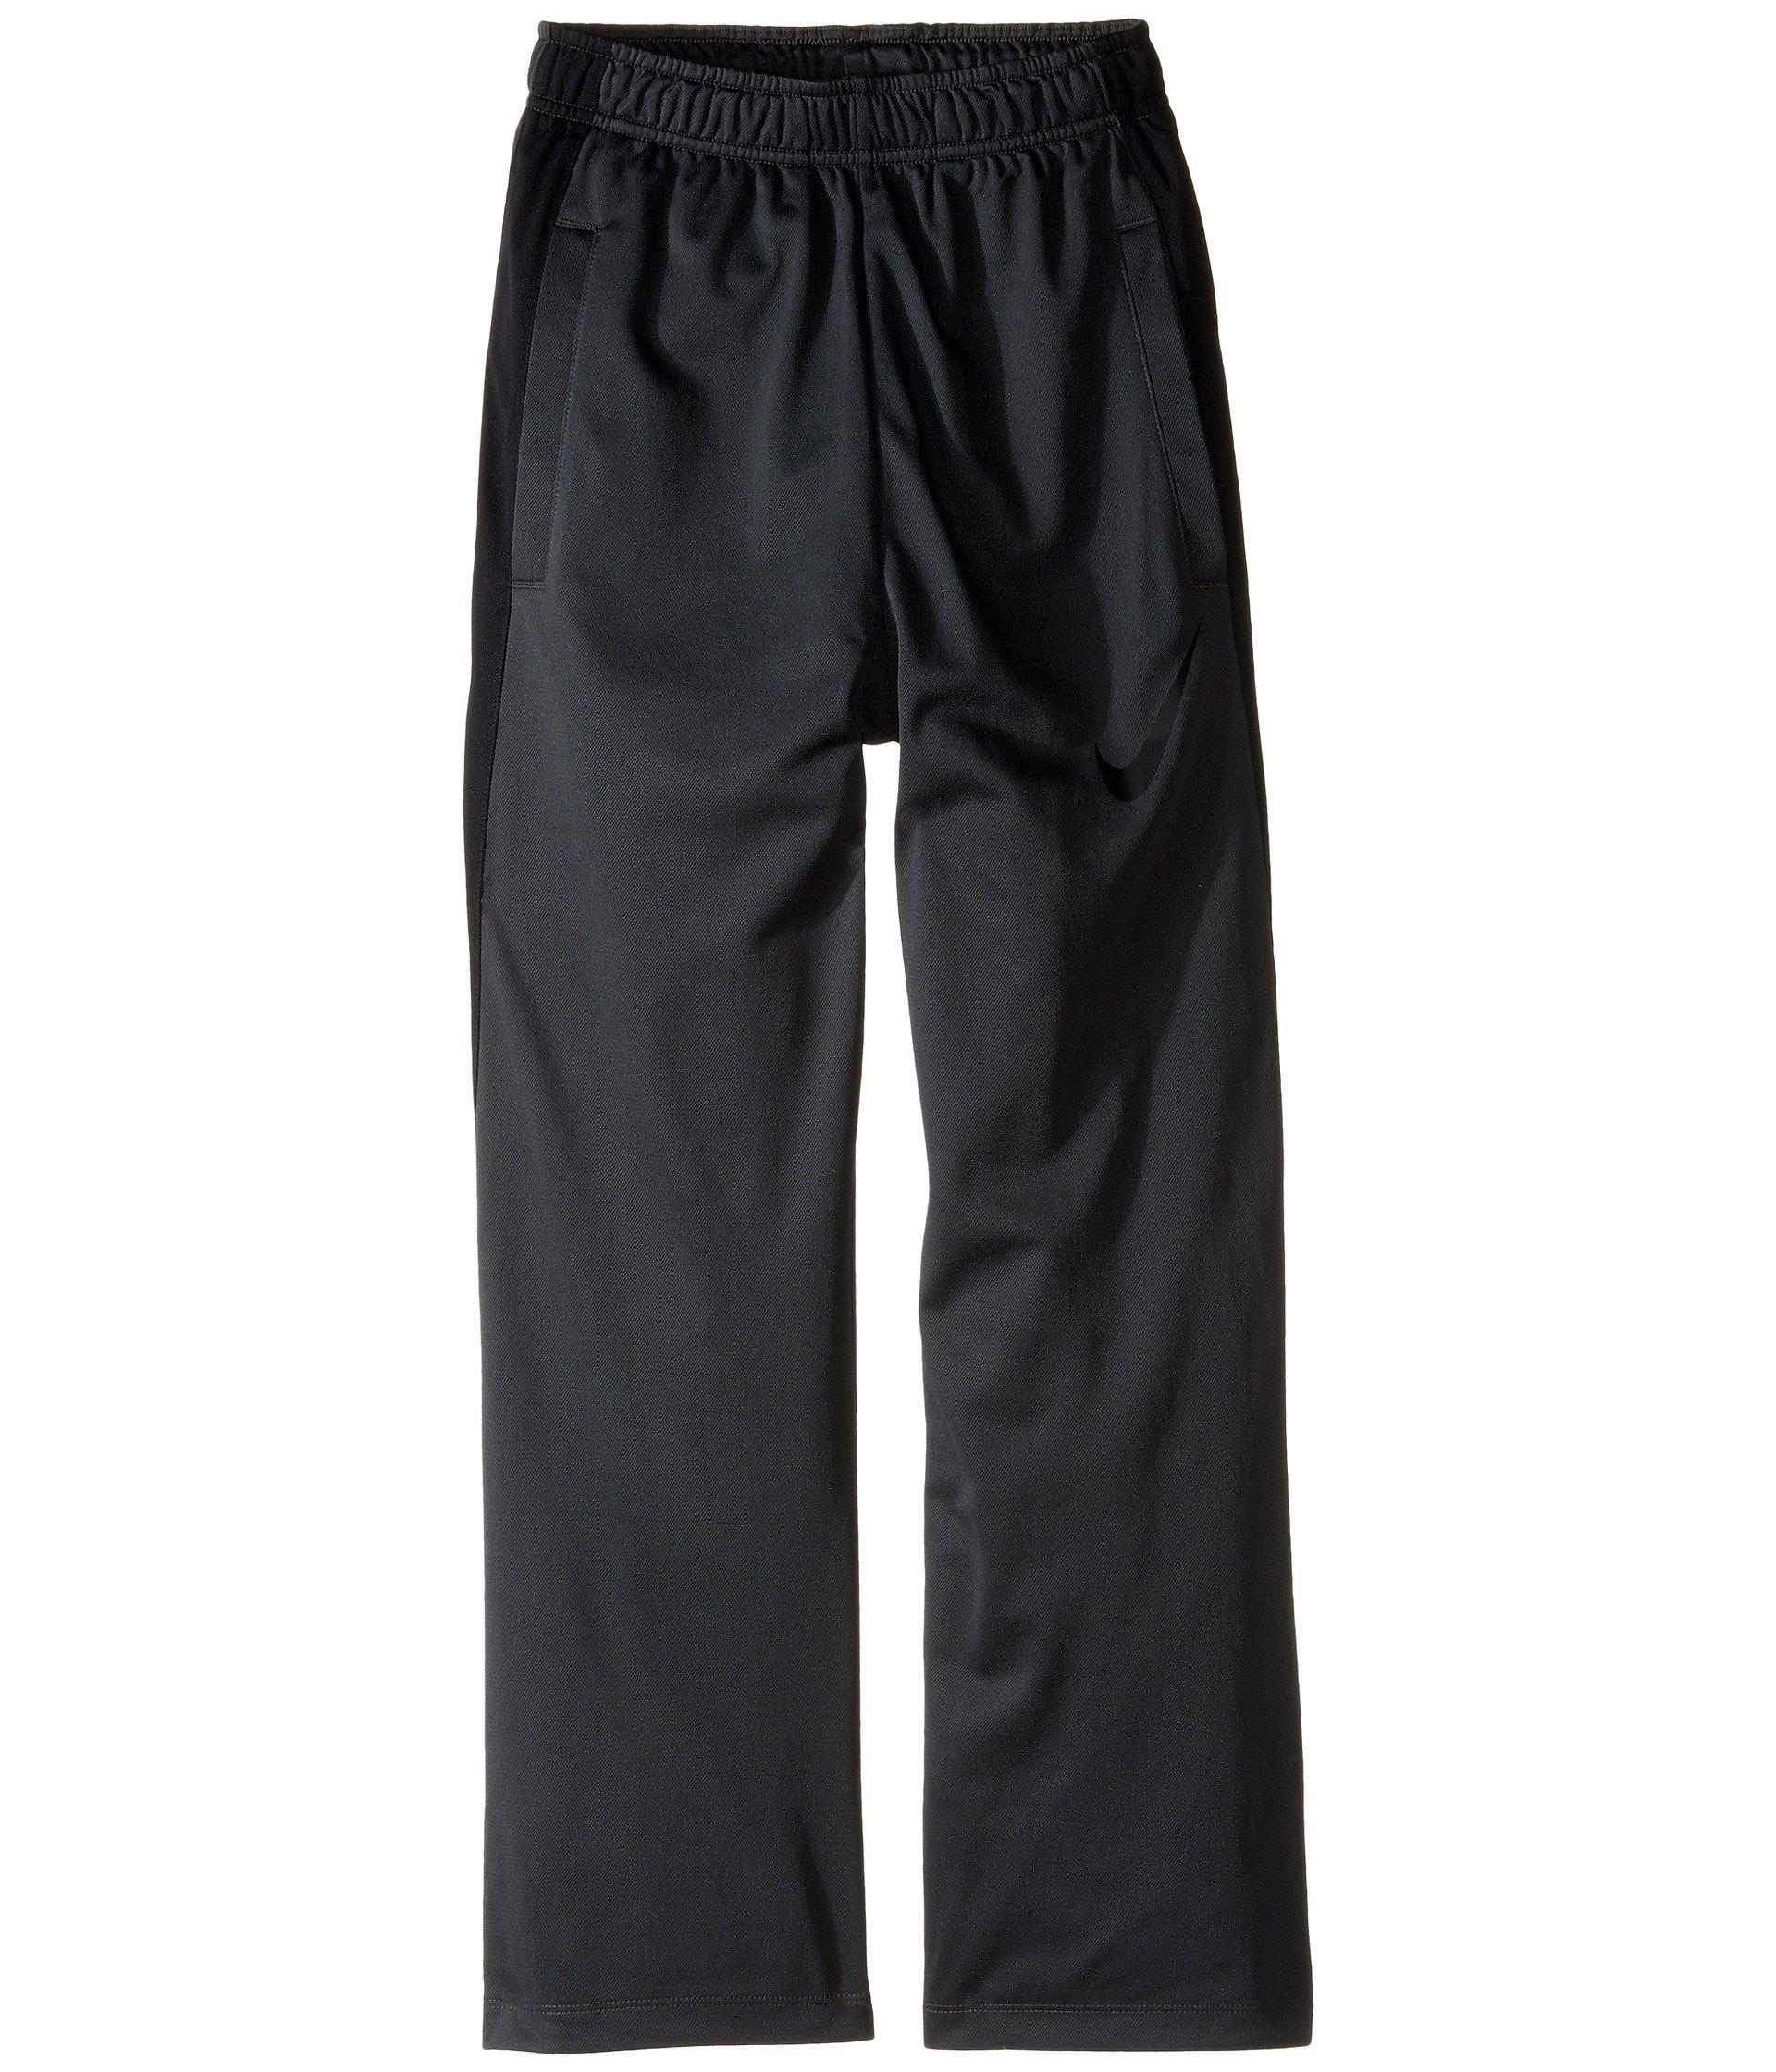 NIKE Boys' Dry Performance Knit Pants, Anthracite/Black/Black, X-Large